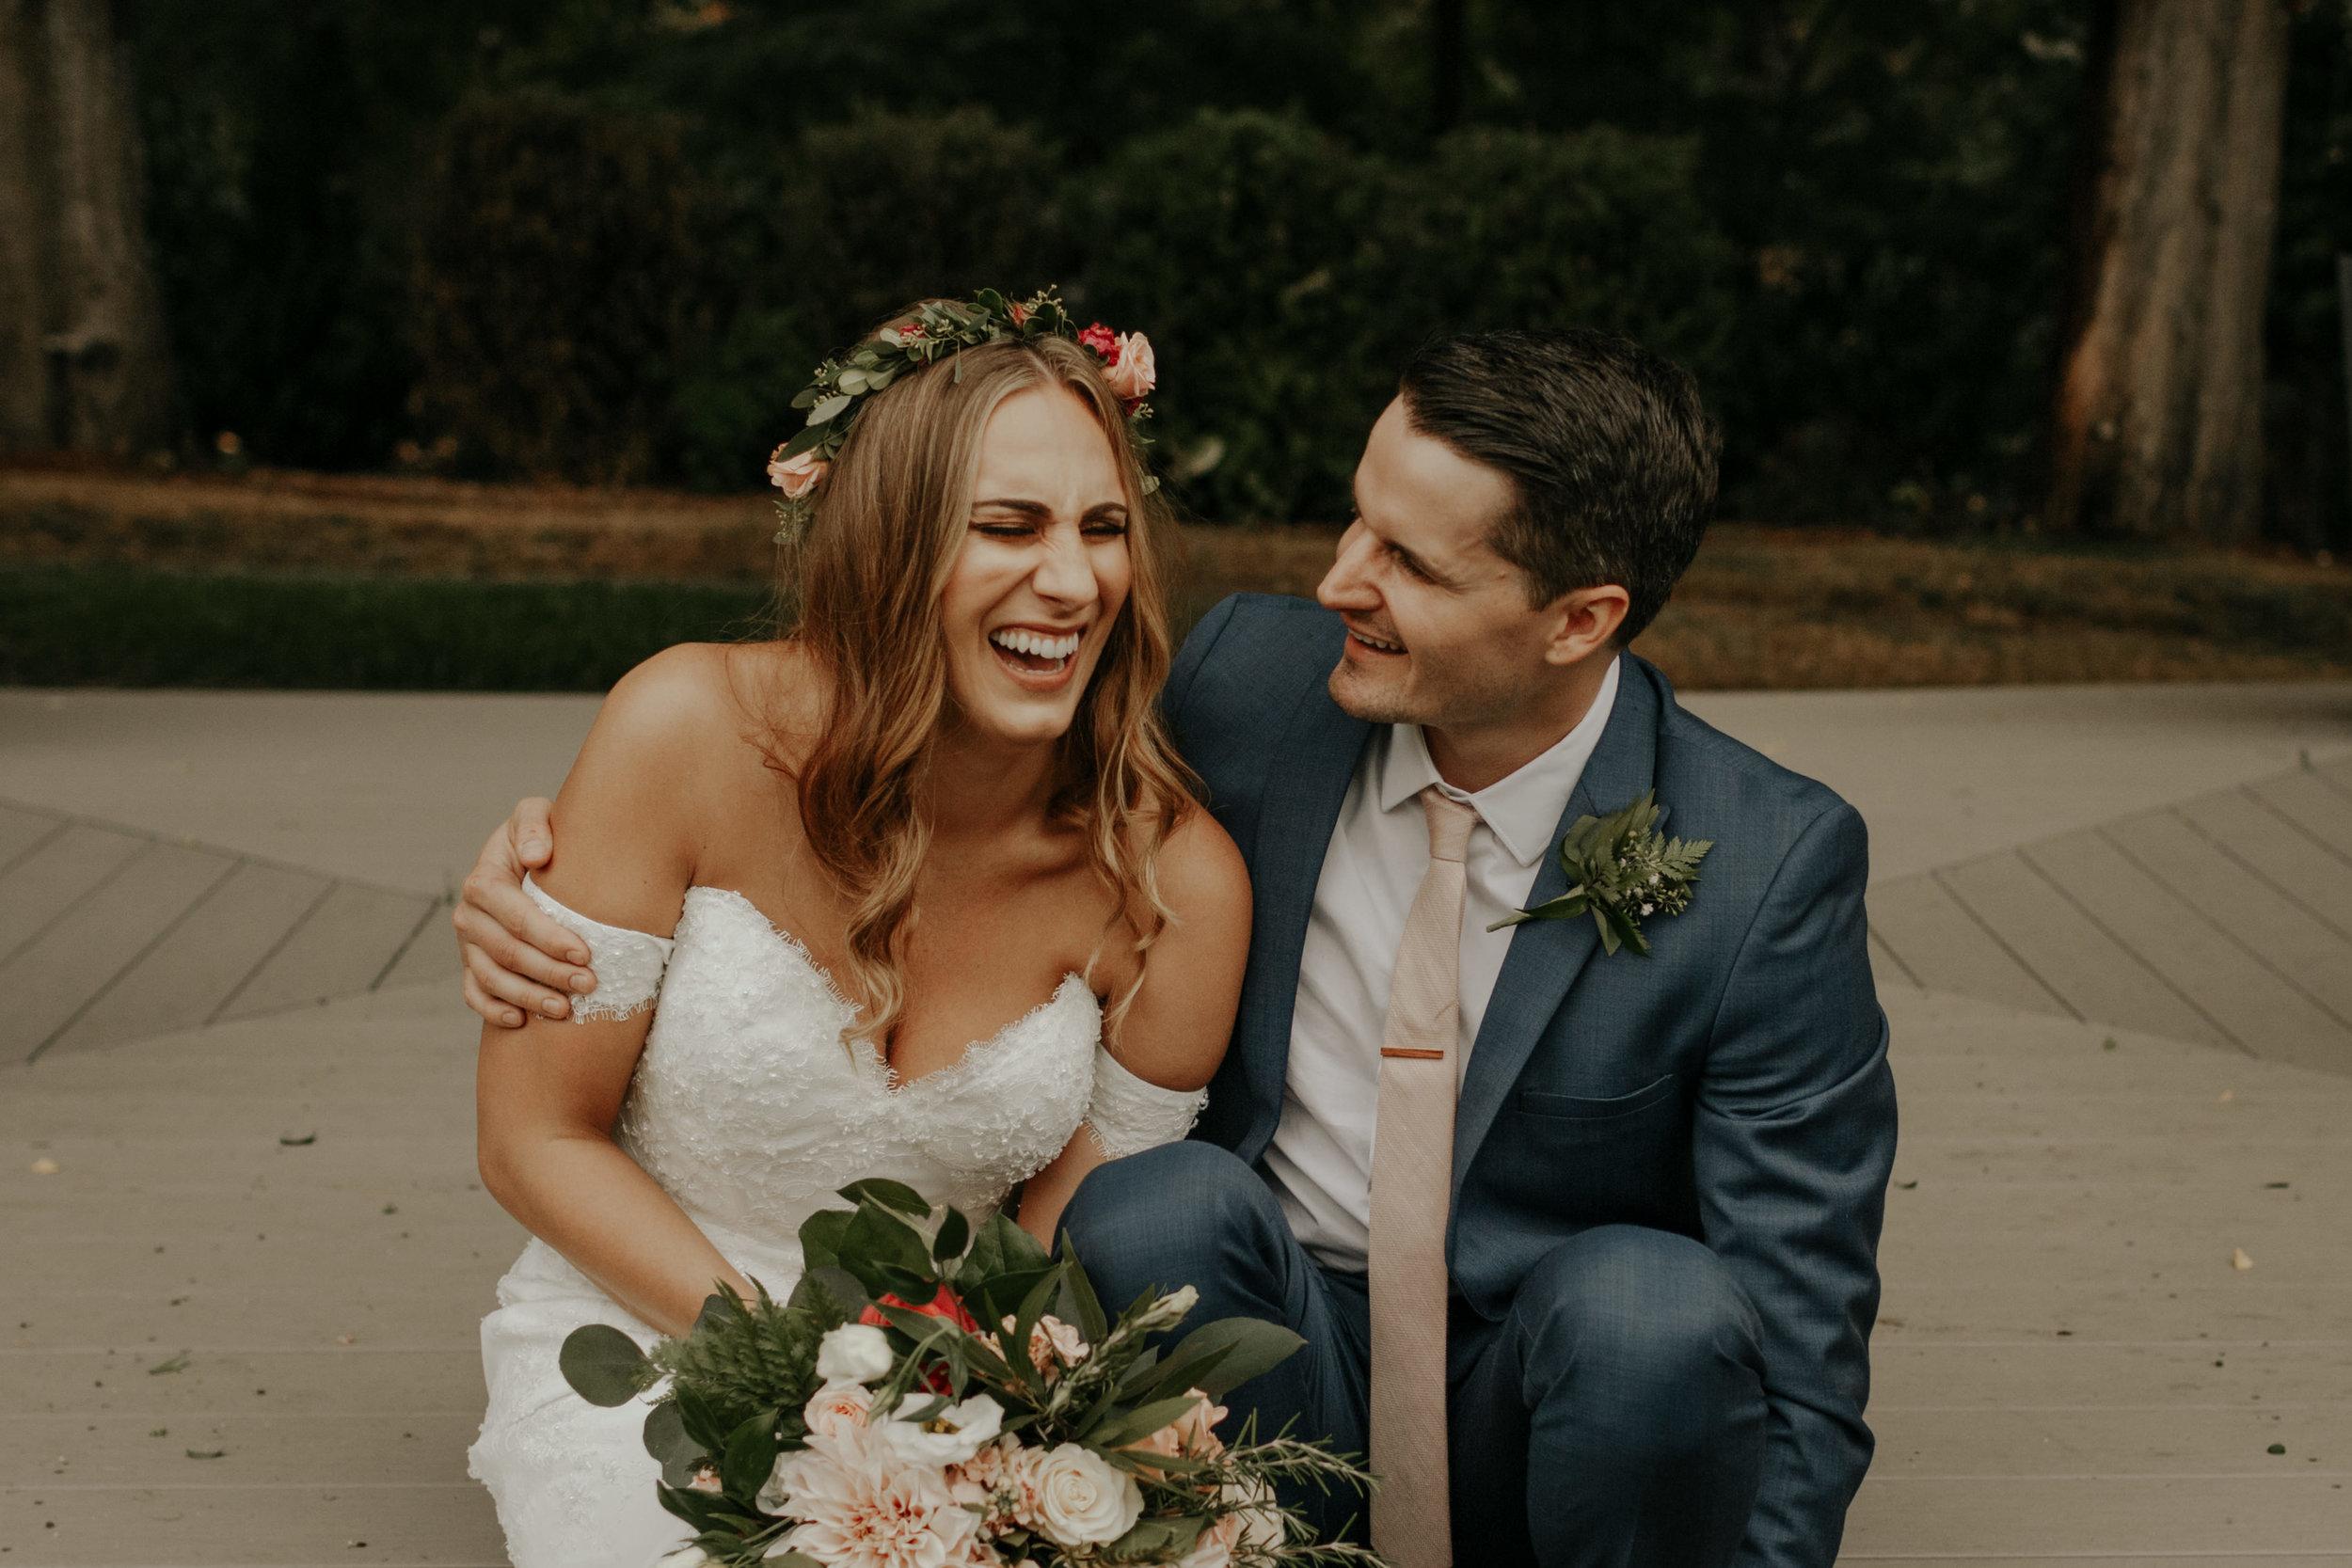 ginapaulson_jakitrevor_wedding-758.jpg